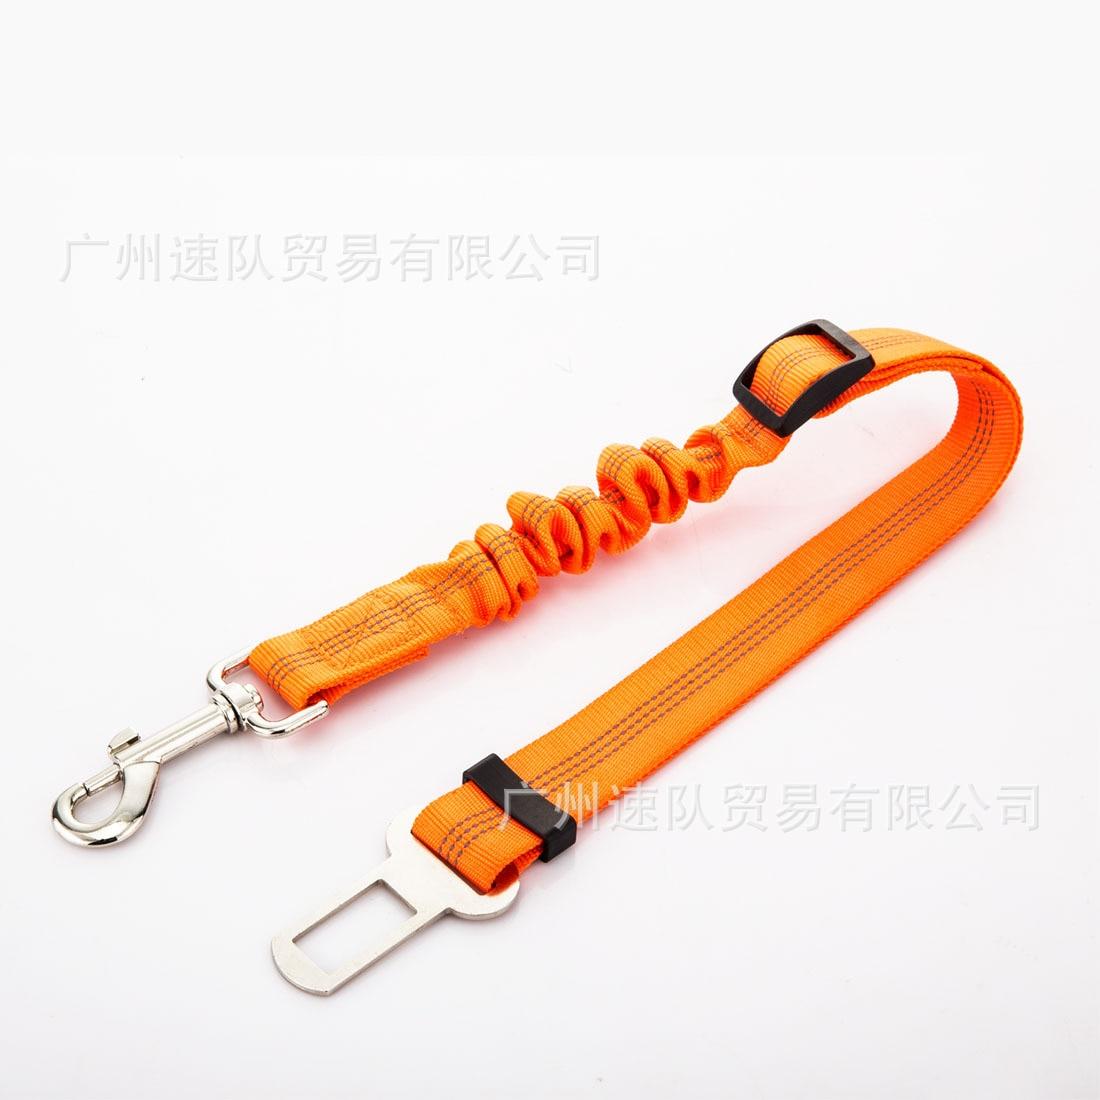 Pet Seat Belt Nylon Reflective Yarn Elasticity Buffer Regulation Car Mounted Safe Rope Dog Hand Holding Rope Car